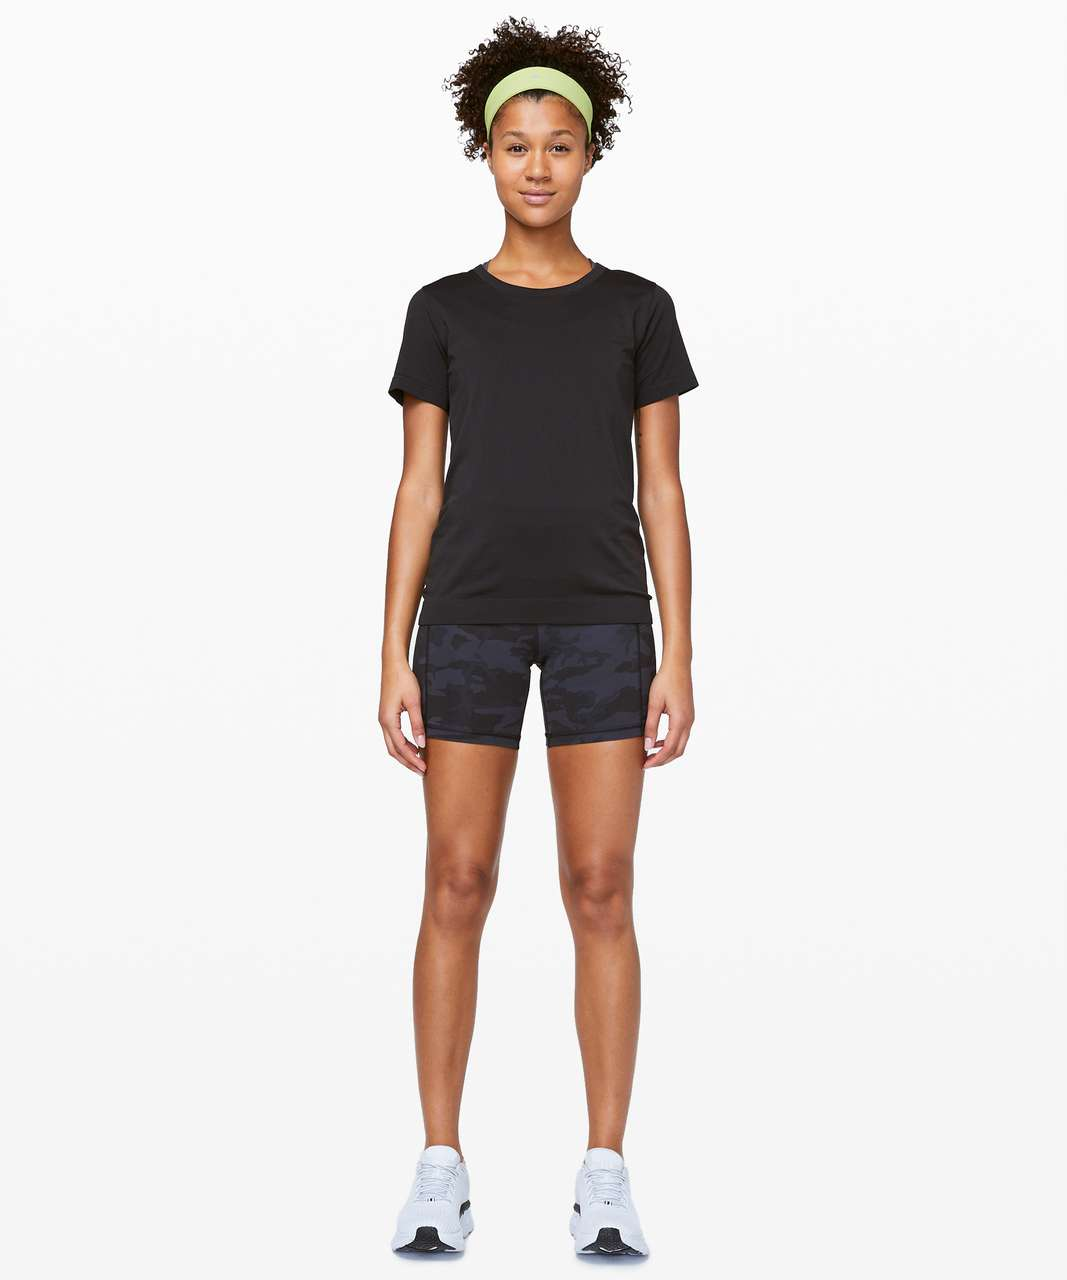 Lululemon Swiftly Tech Short Sleeve (Breeze) *Relaxed Fit - Black / Black